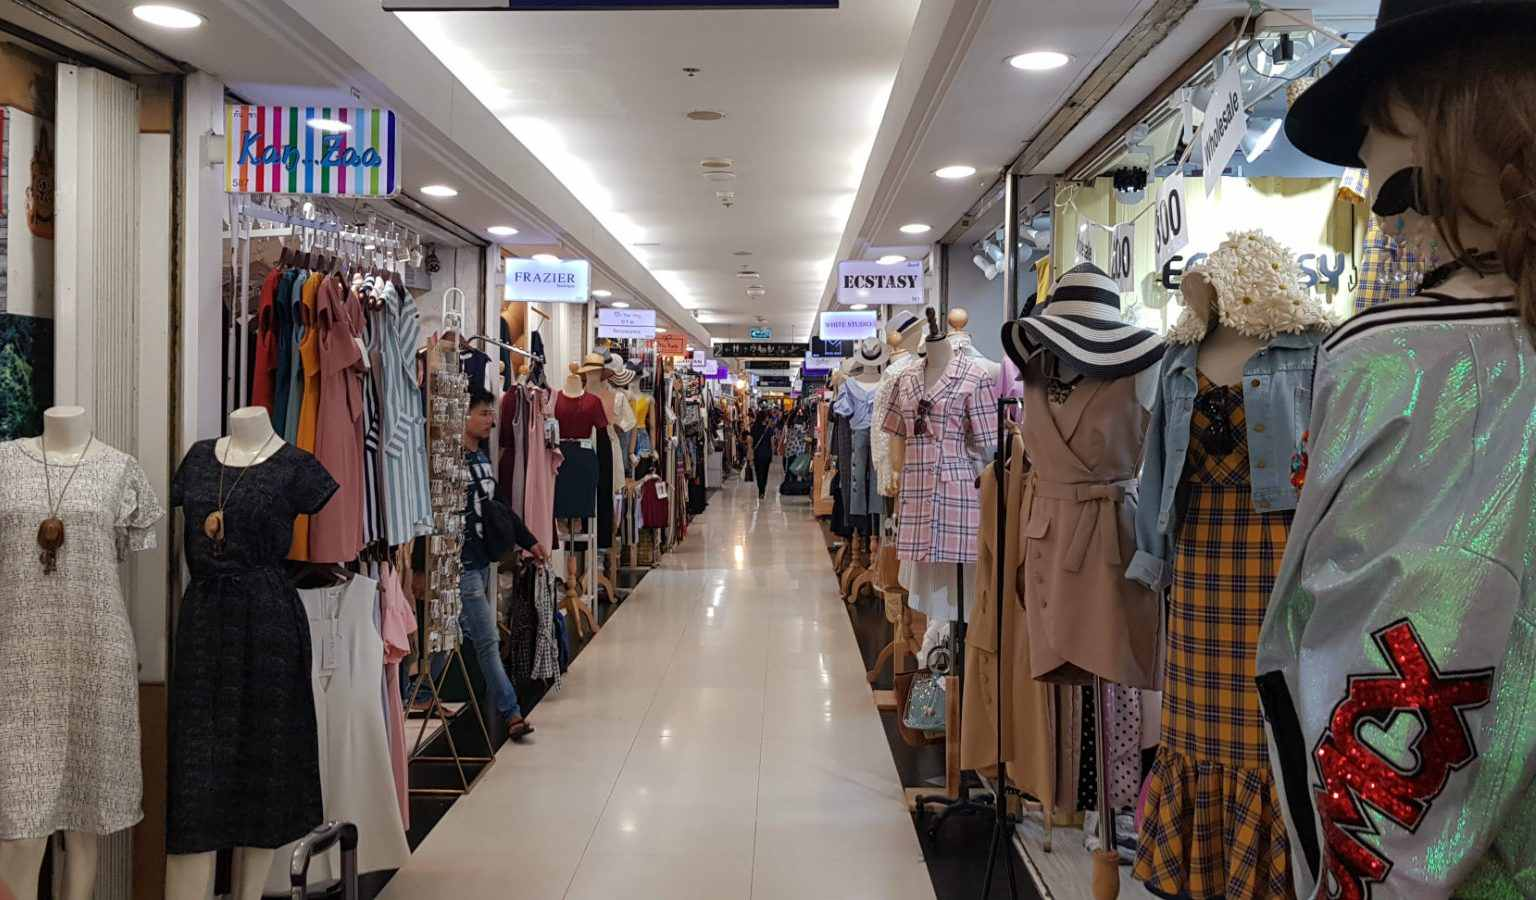 Long corridor with small clothing shops on both sides at Platinum Fashion Mall in Bangkok